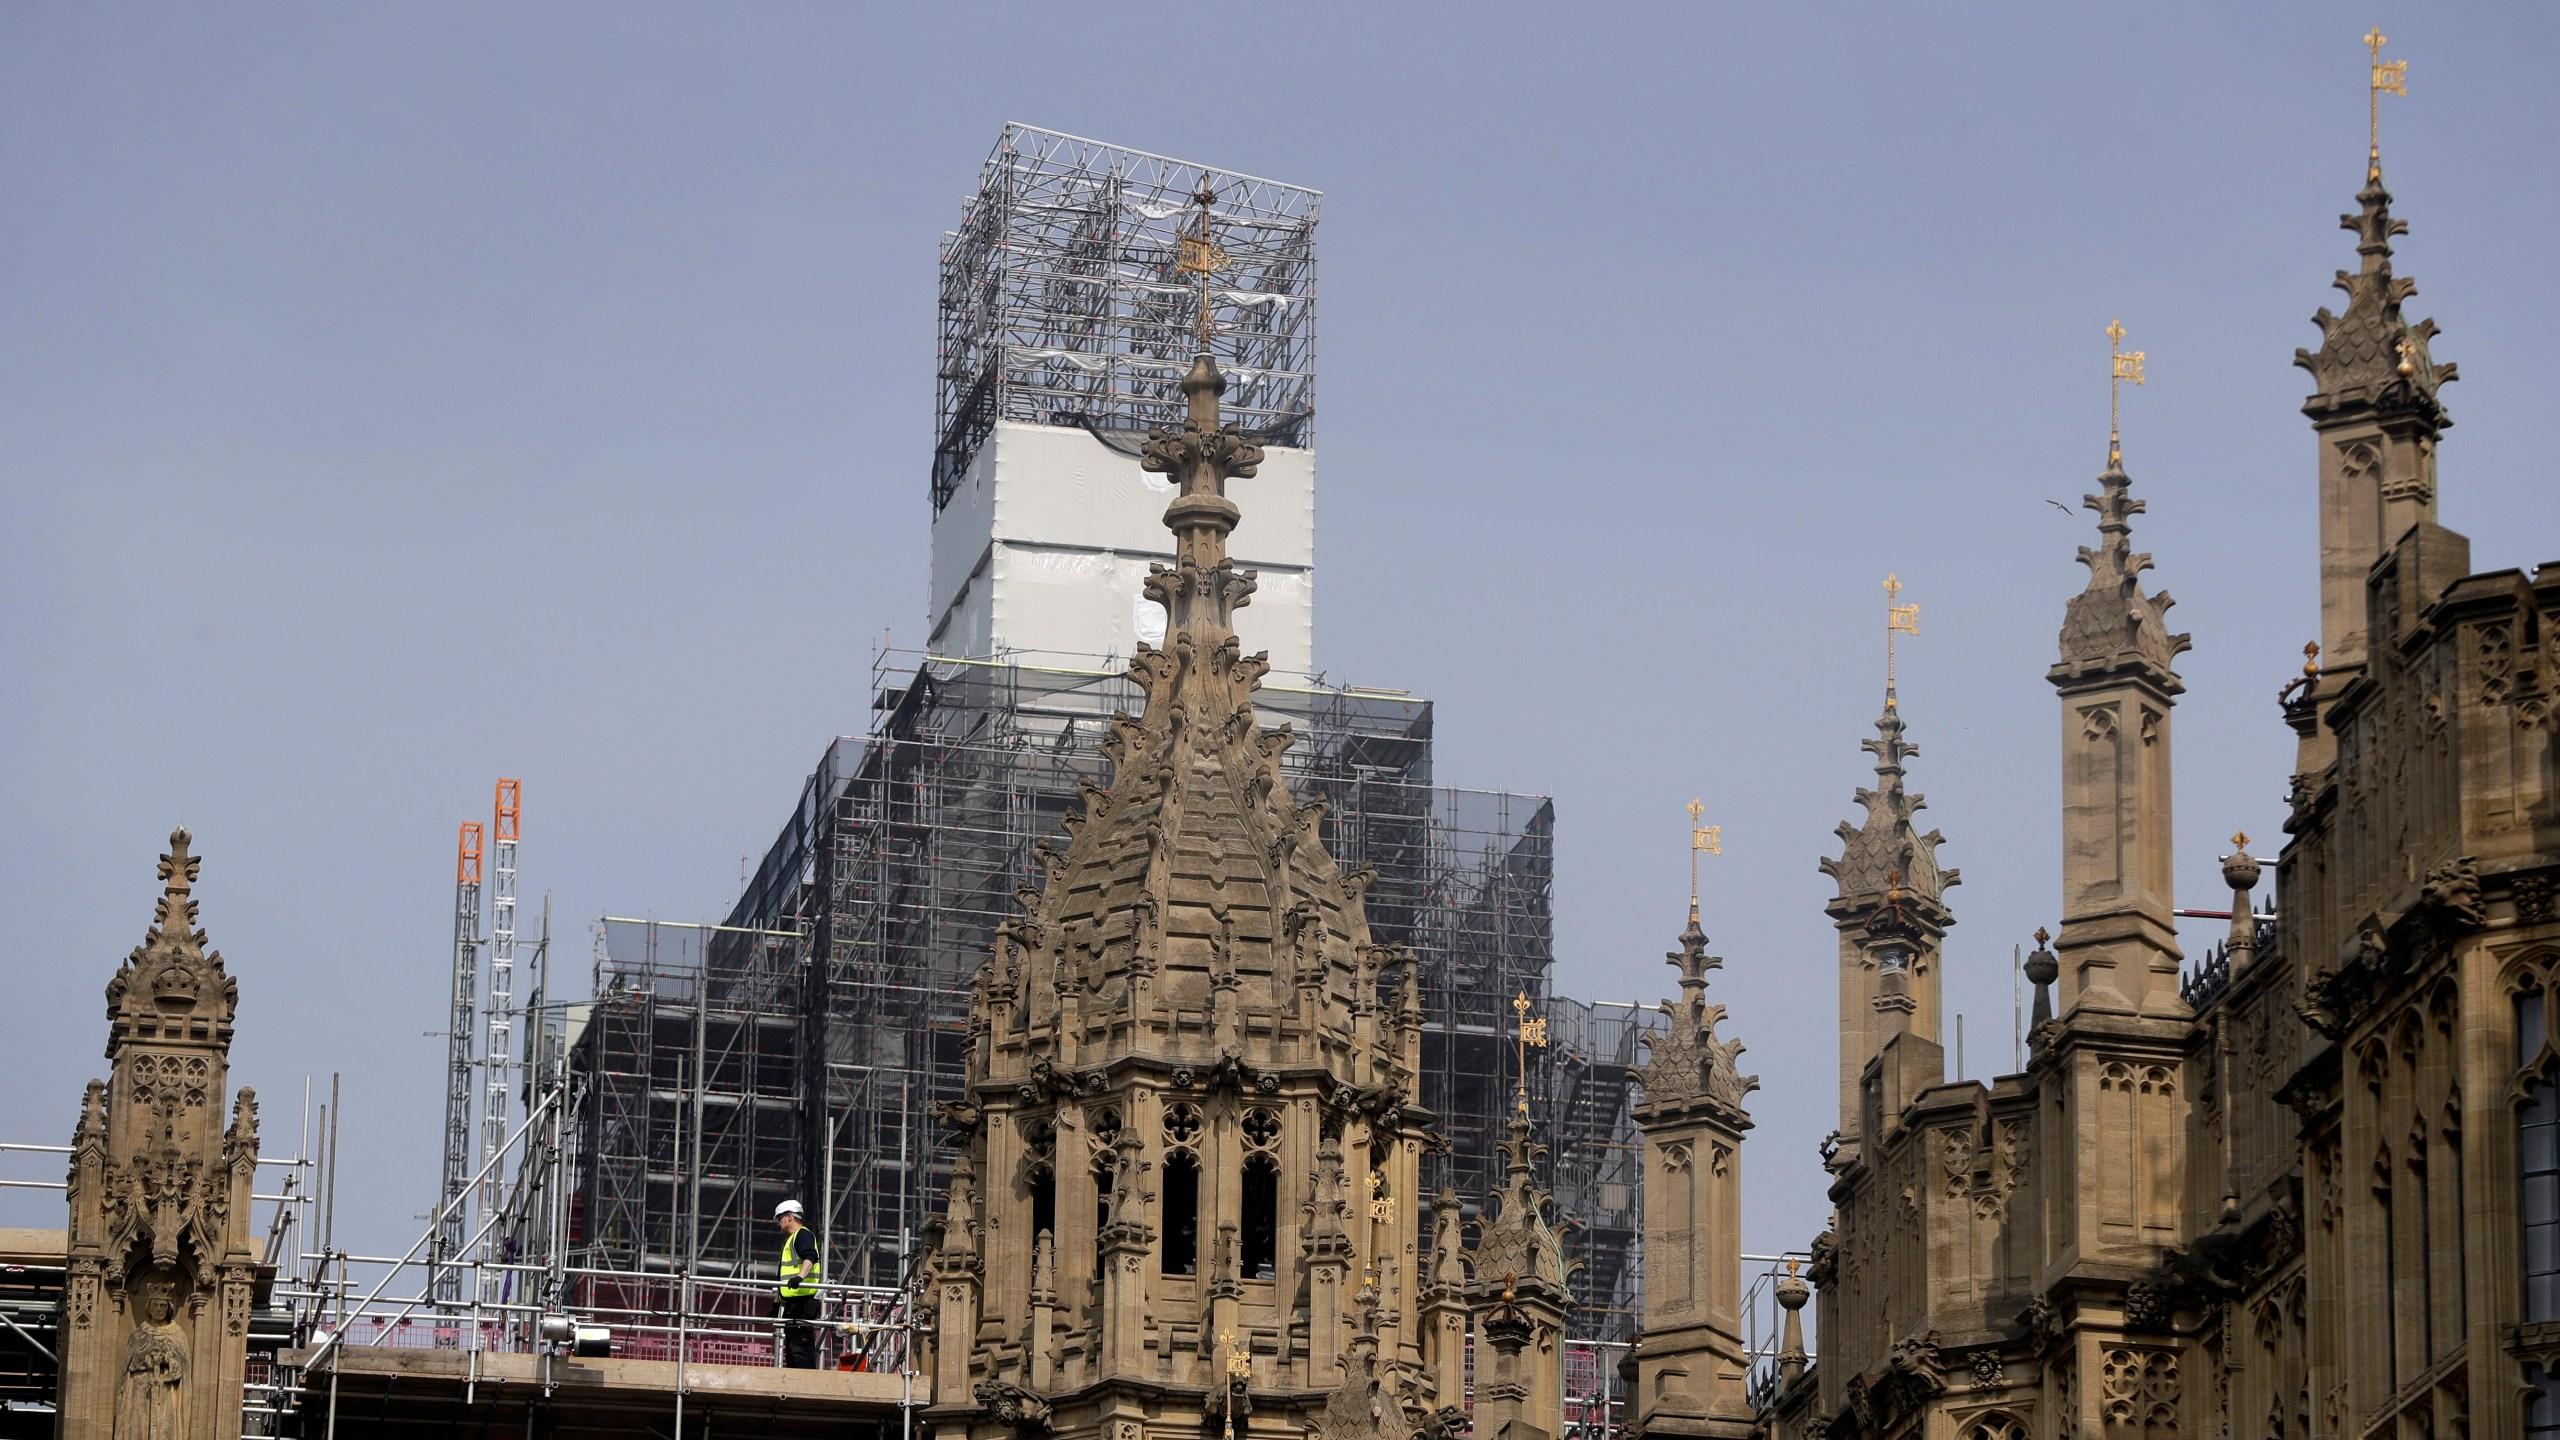 Notre_Dame_Warning_for_Britain_72239-159532.jpg11764673